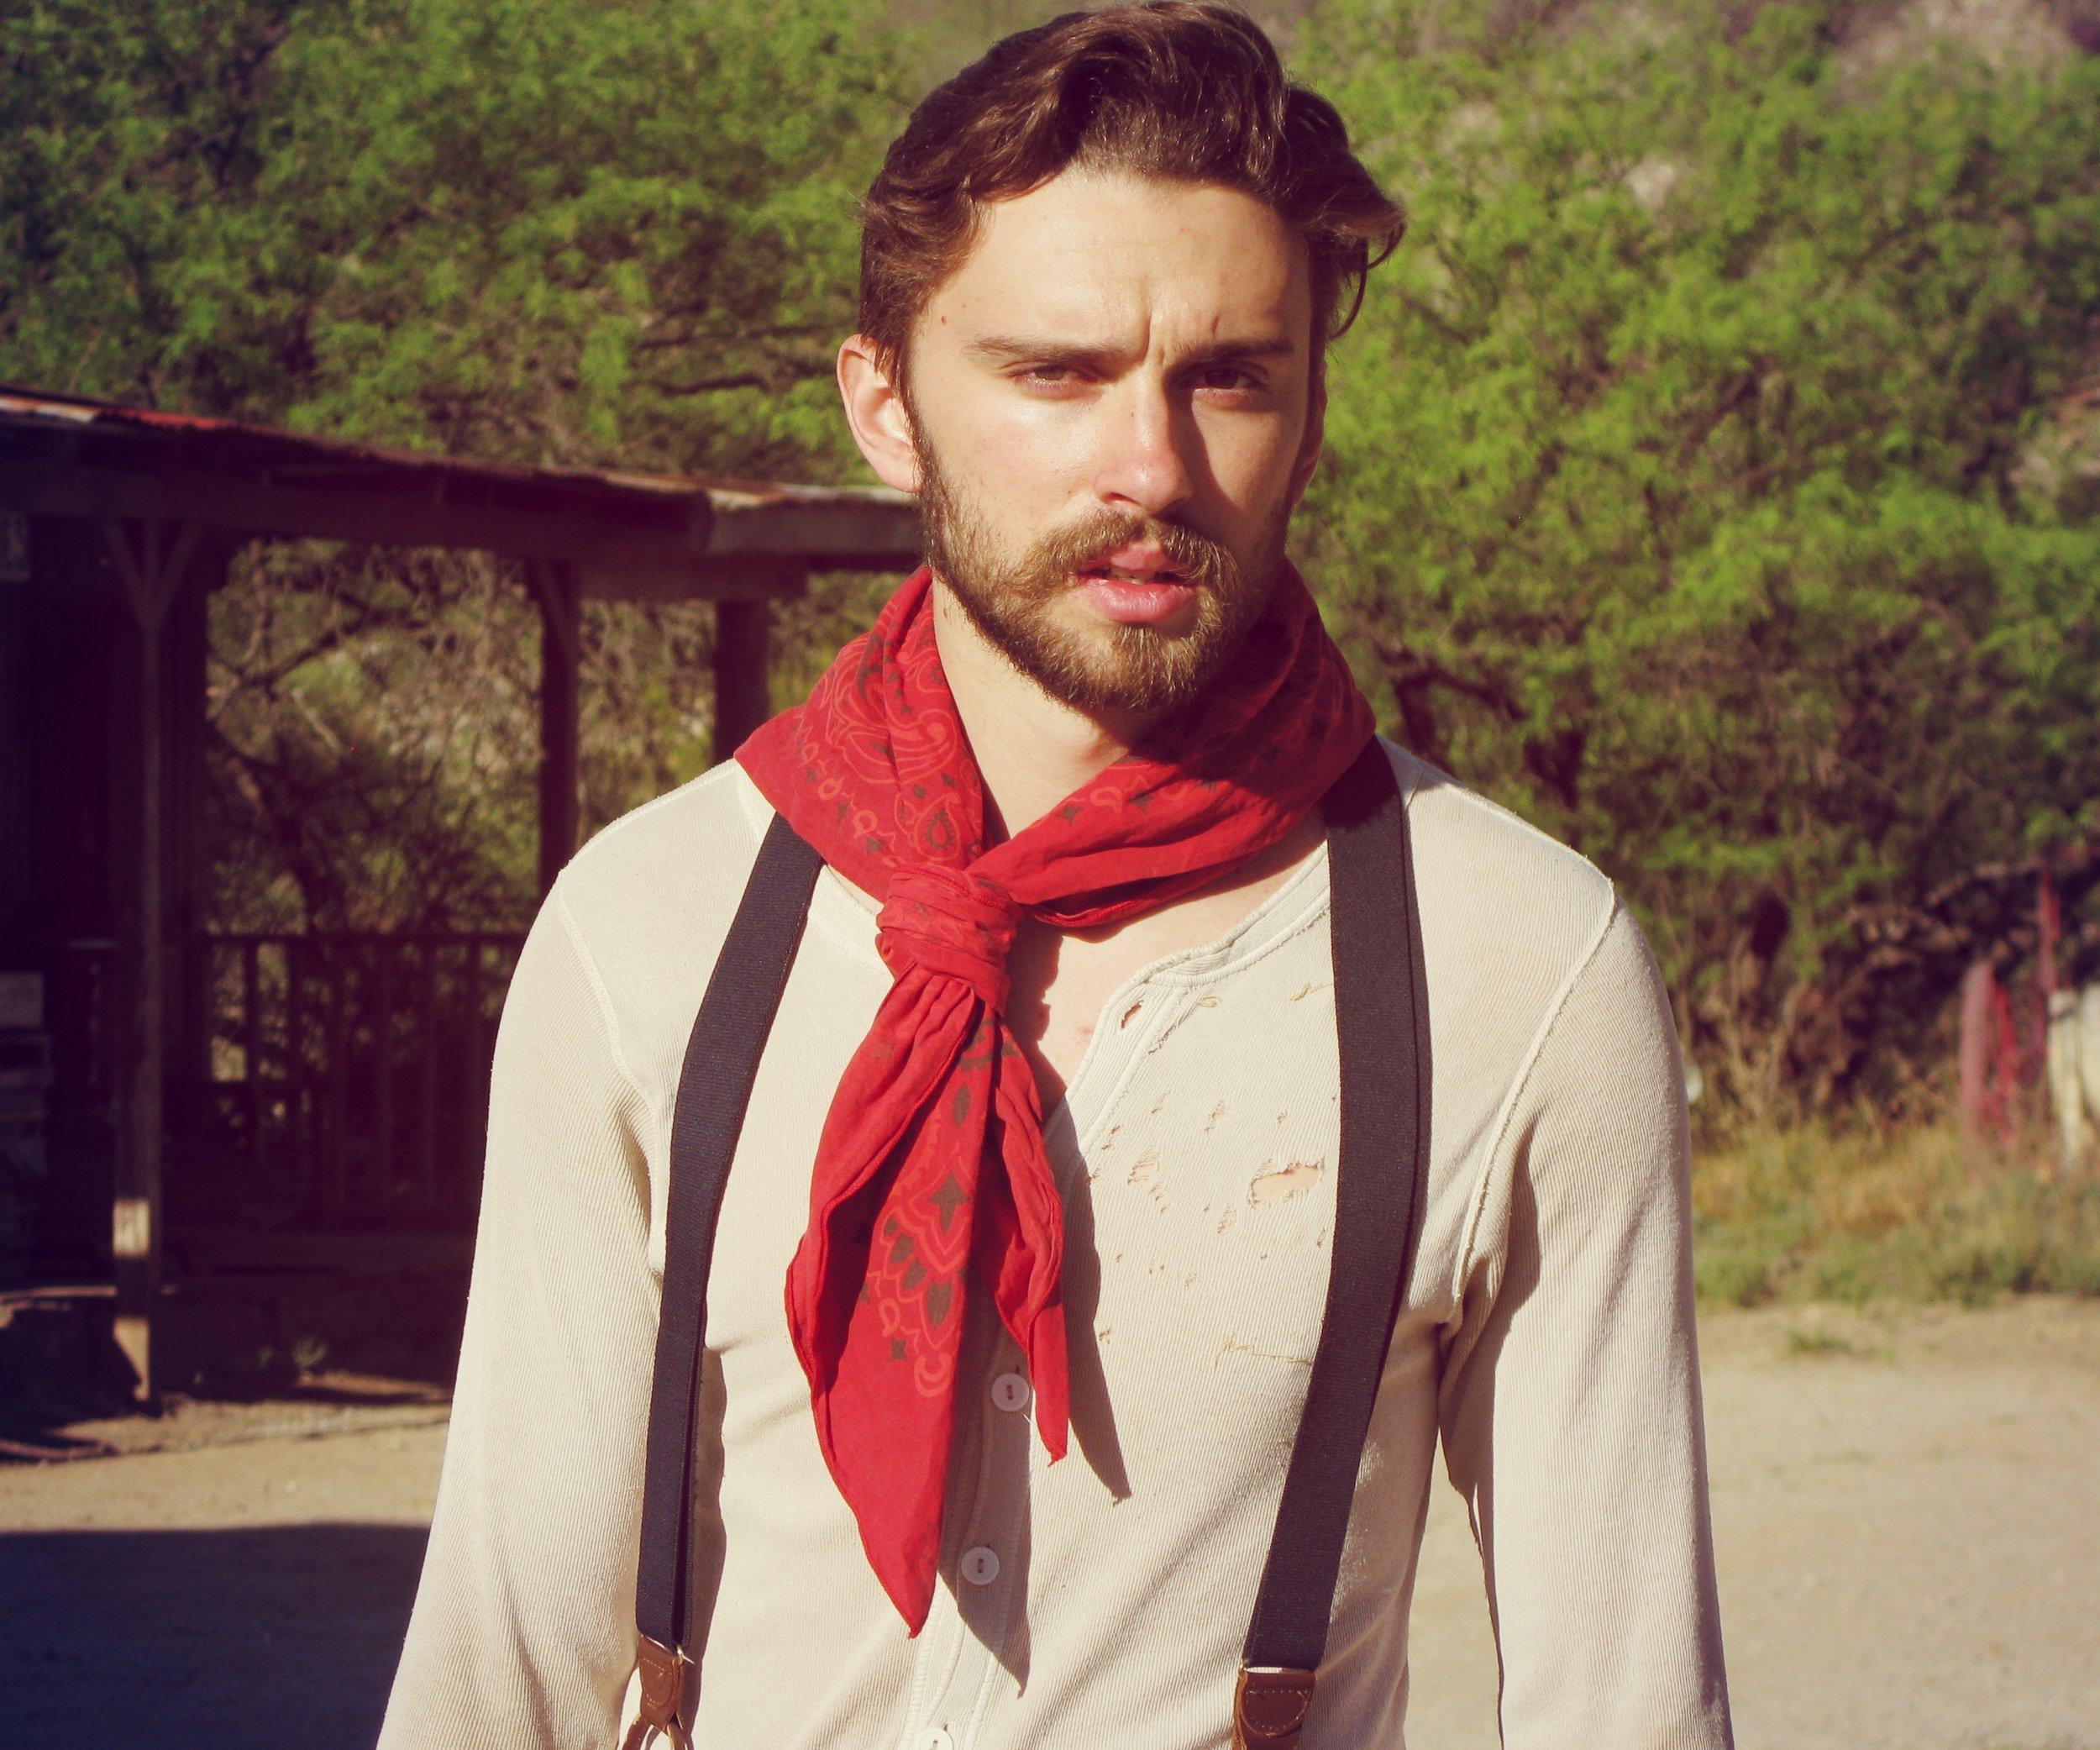 Hayden Wilson as Ace Lockhart